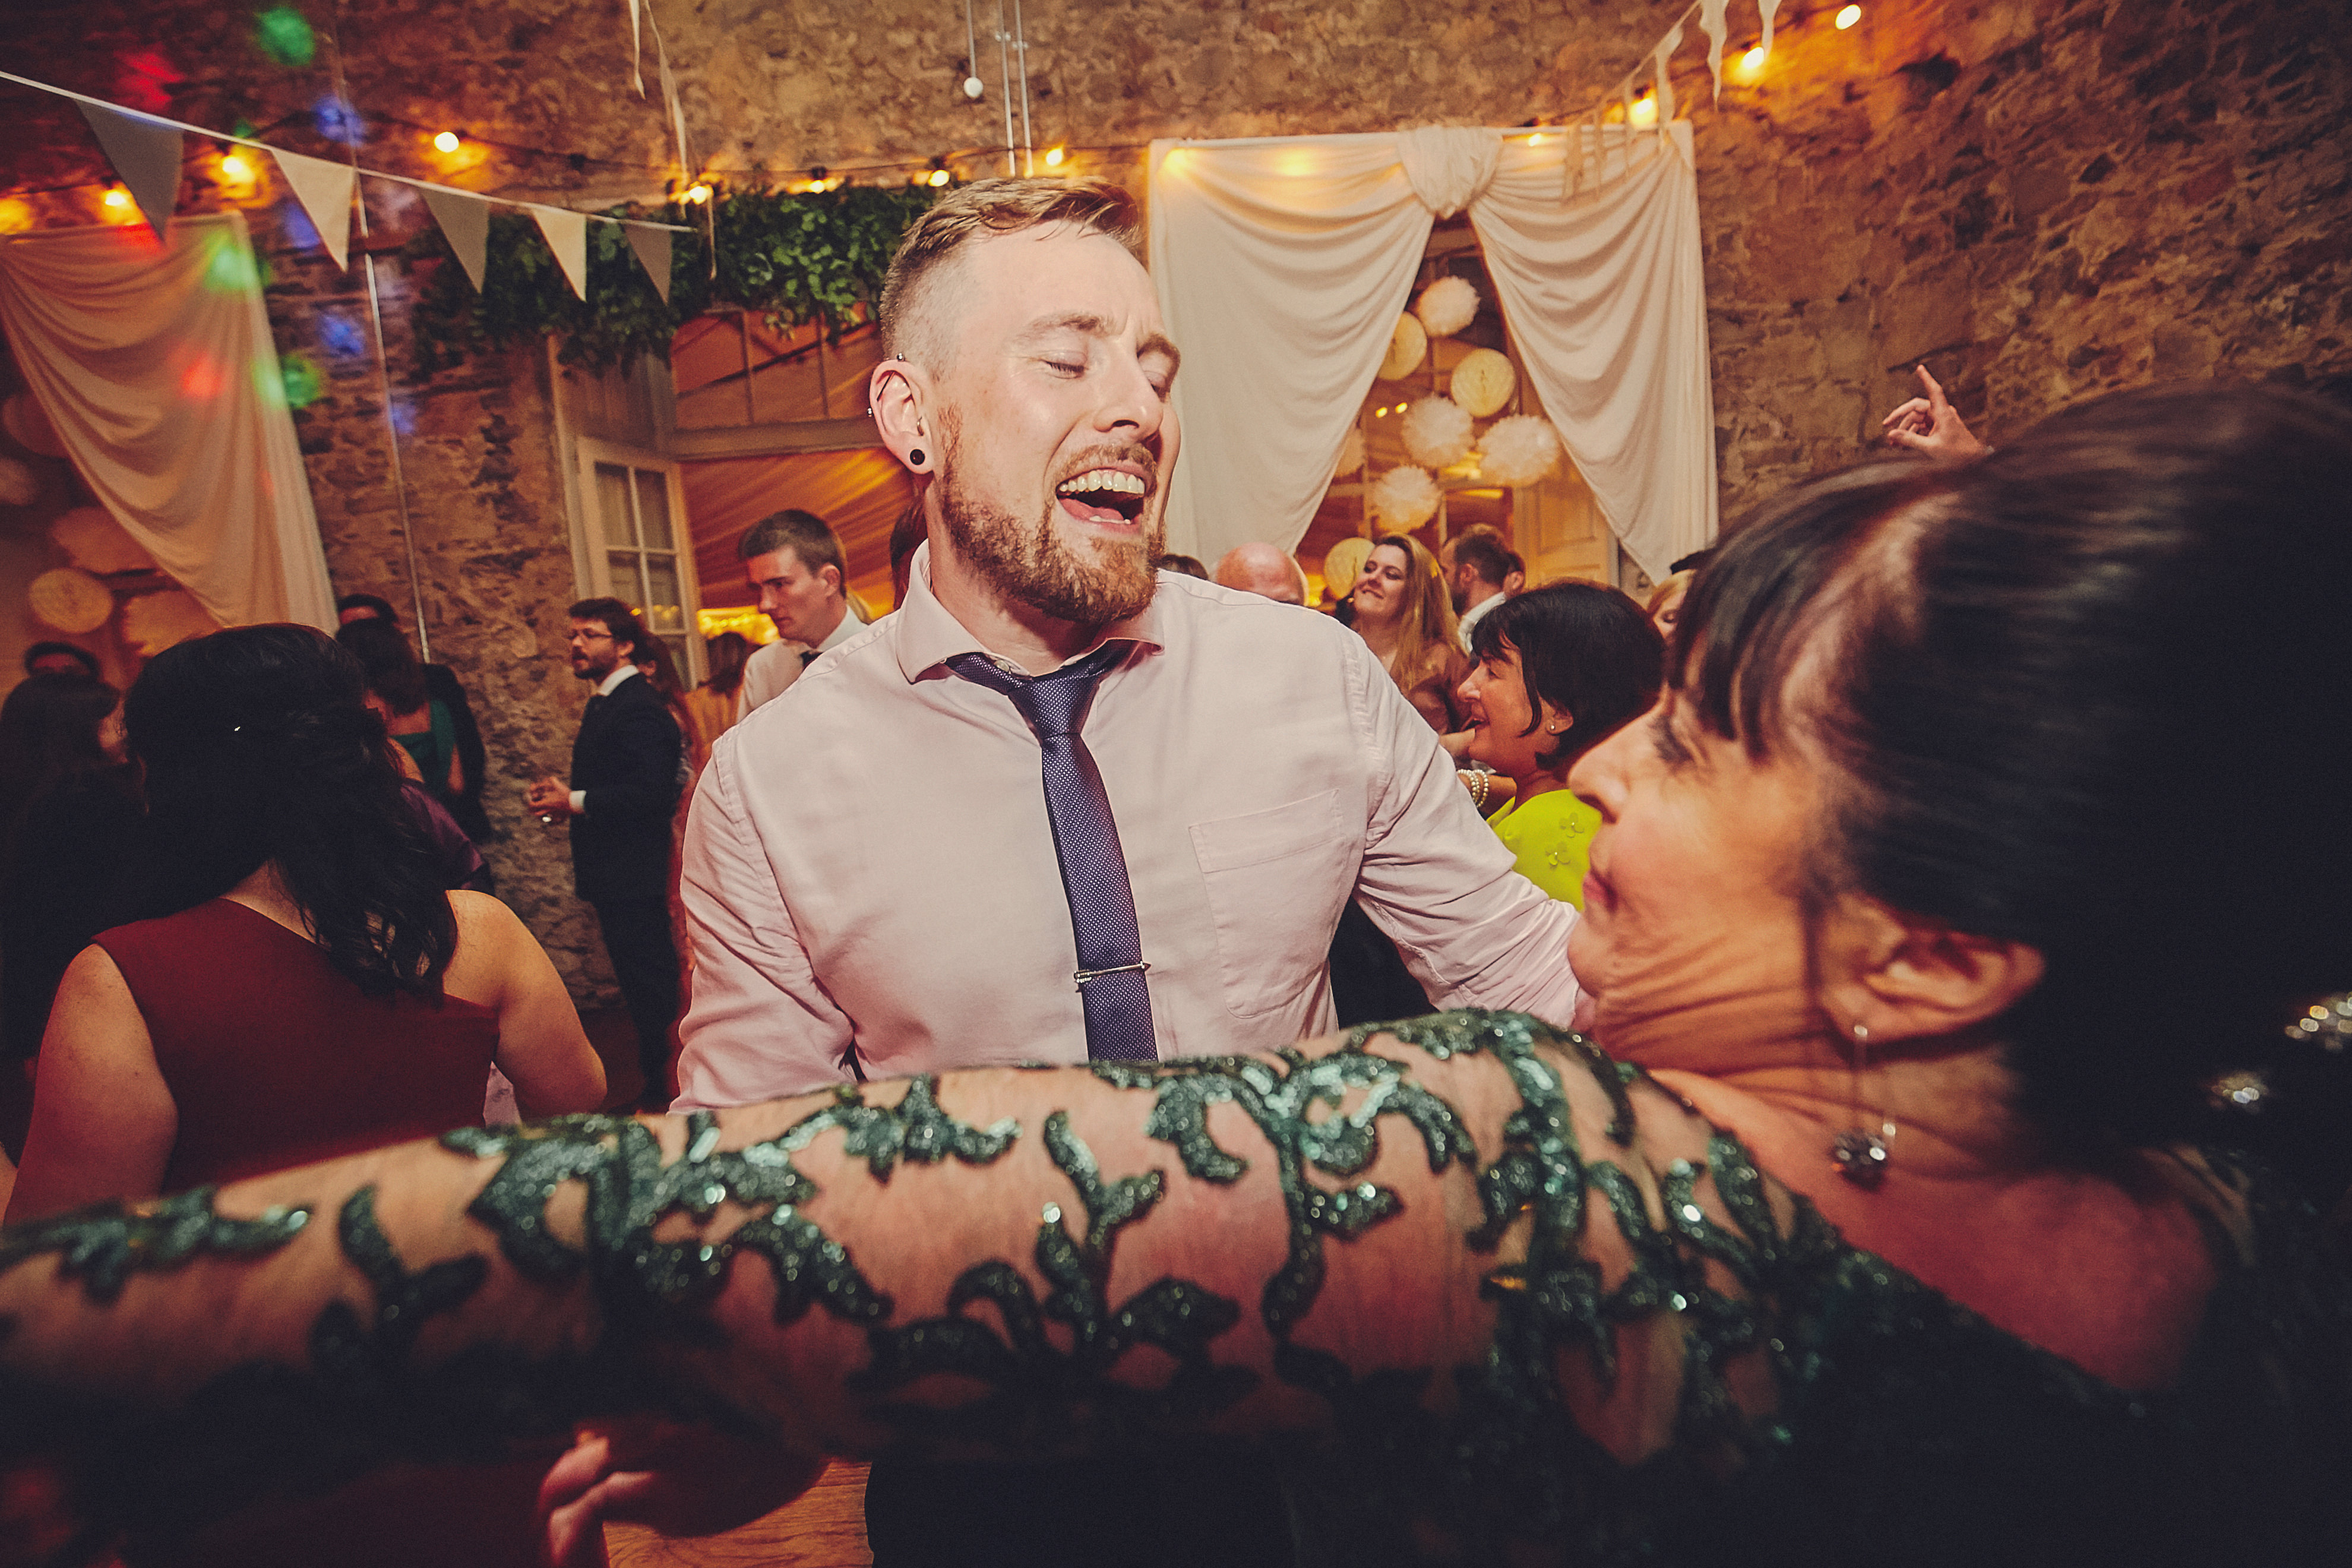 Cloughjordan House weddding164 - Cloughjordan House Wedding - Alternative Venue